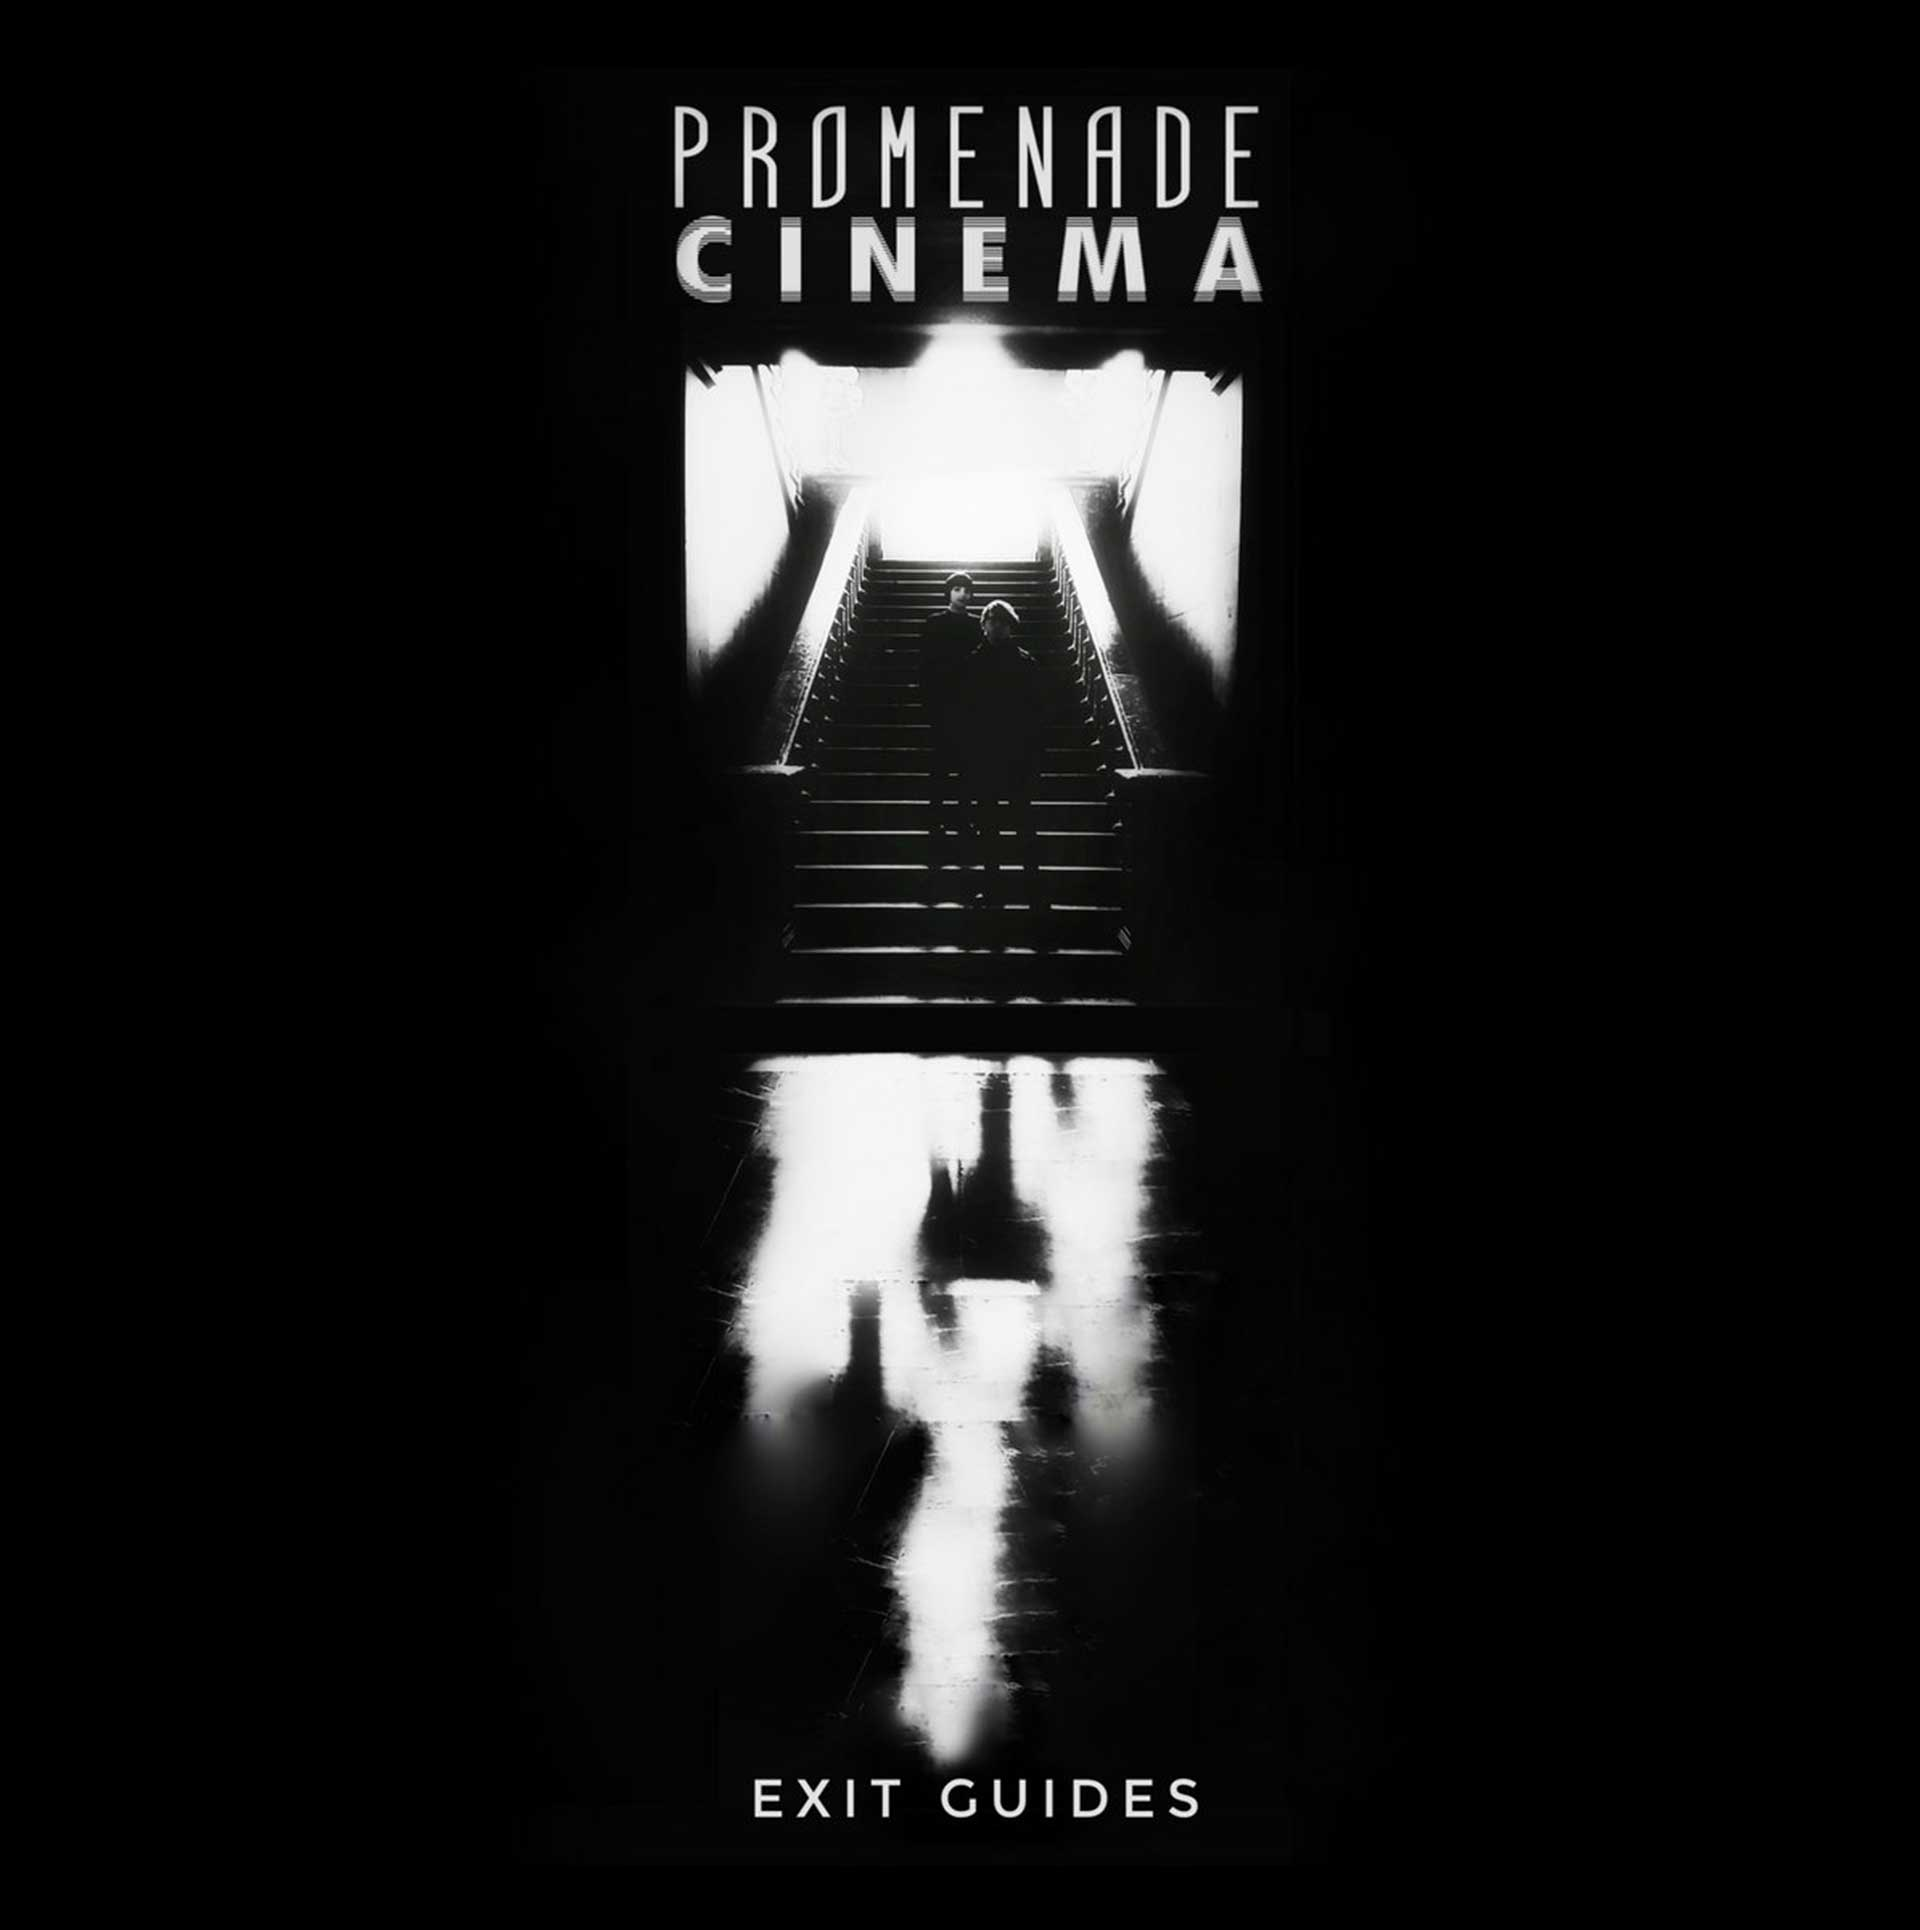 Promenade Cinema - Exit Guides